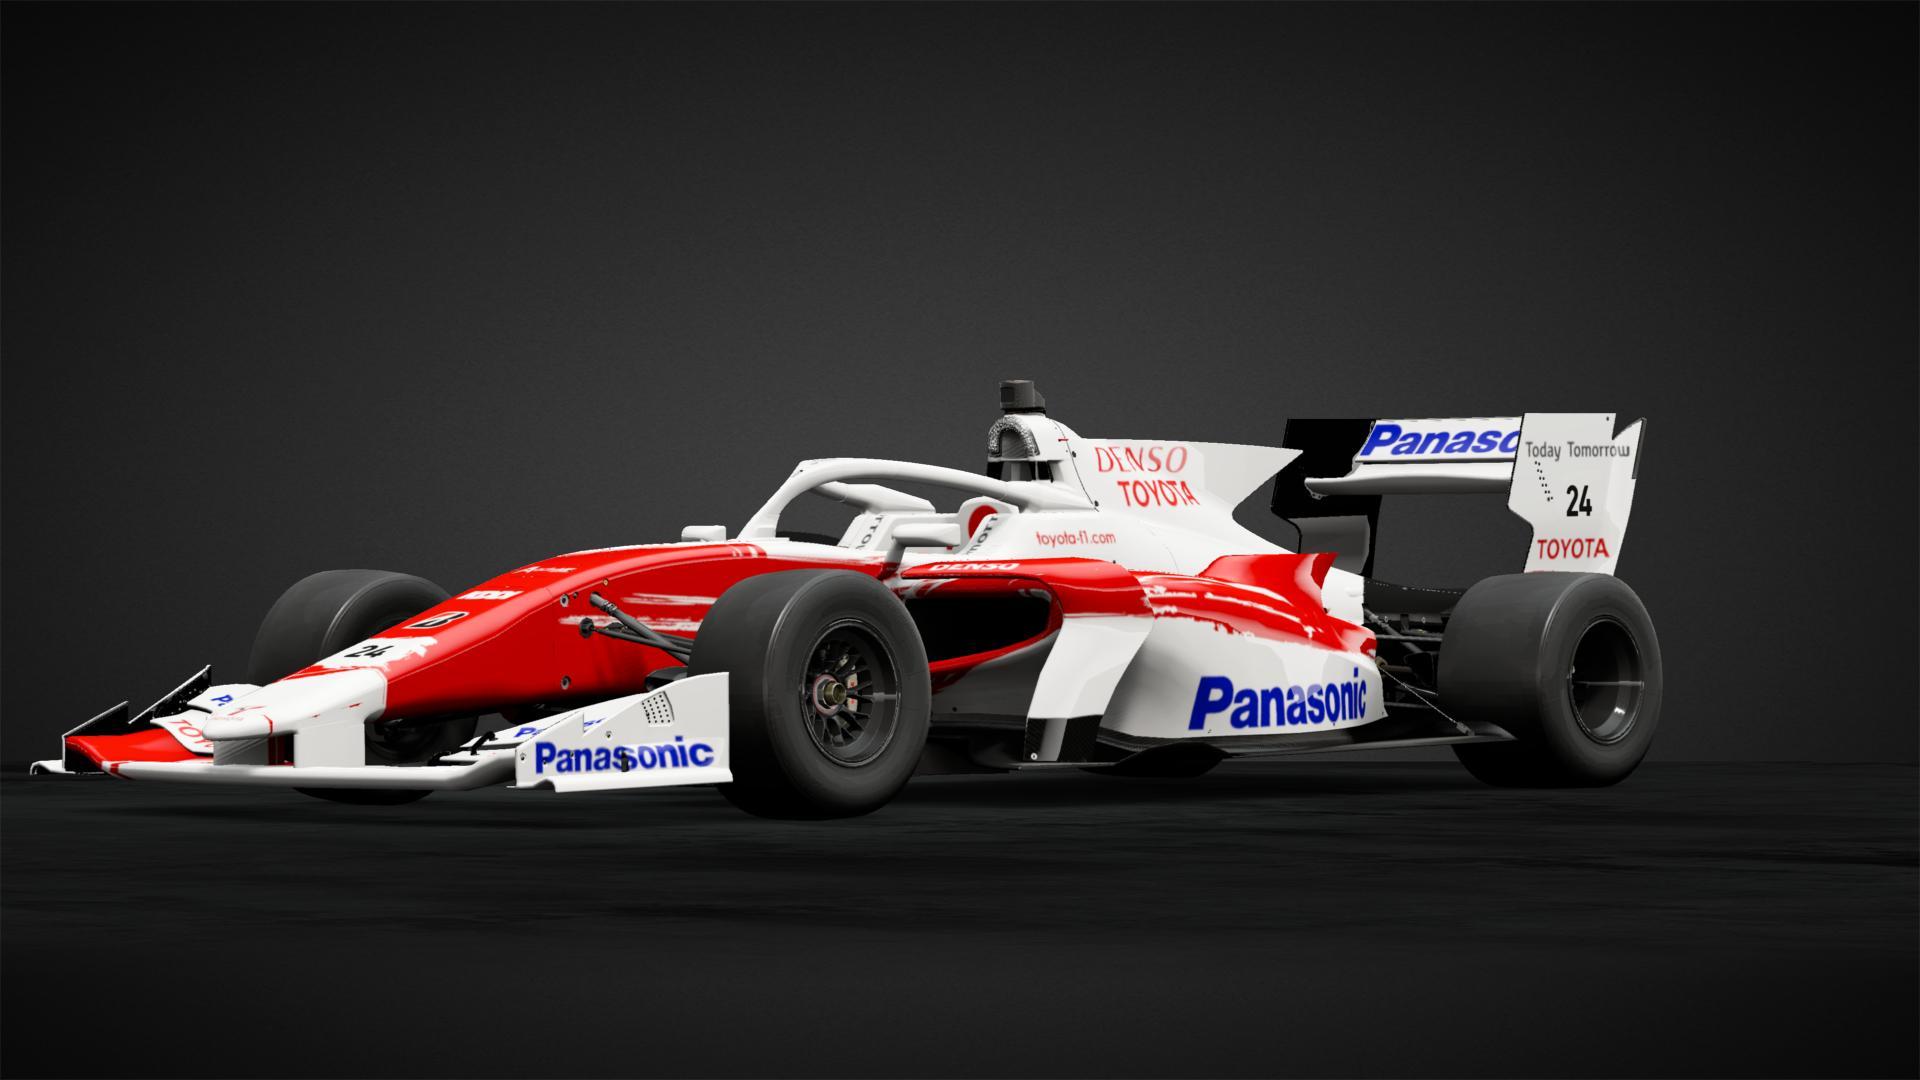 Panasonic Toyota Racing F1 - Car Livery by Paul2007 ...